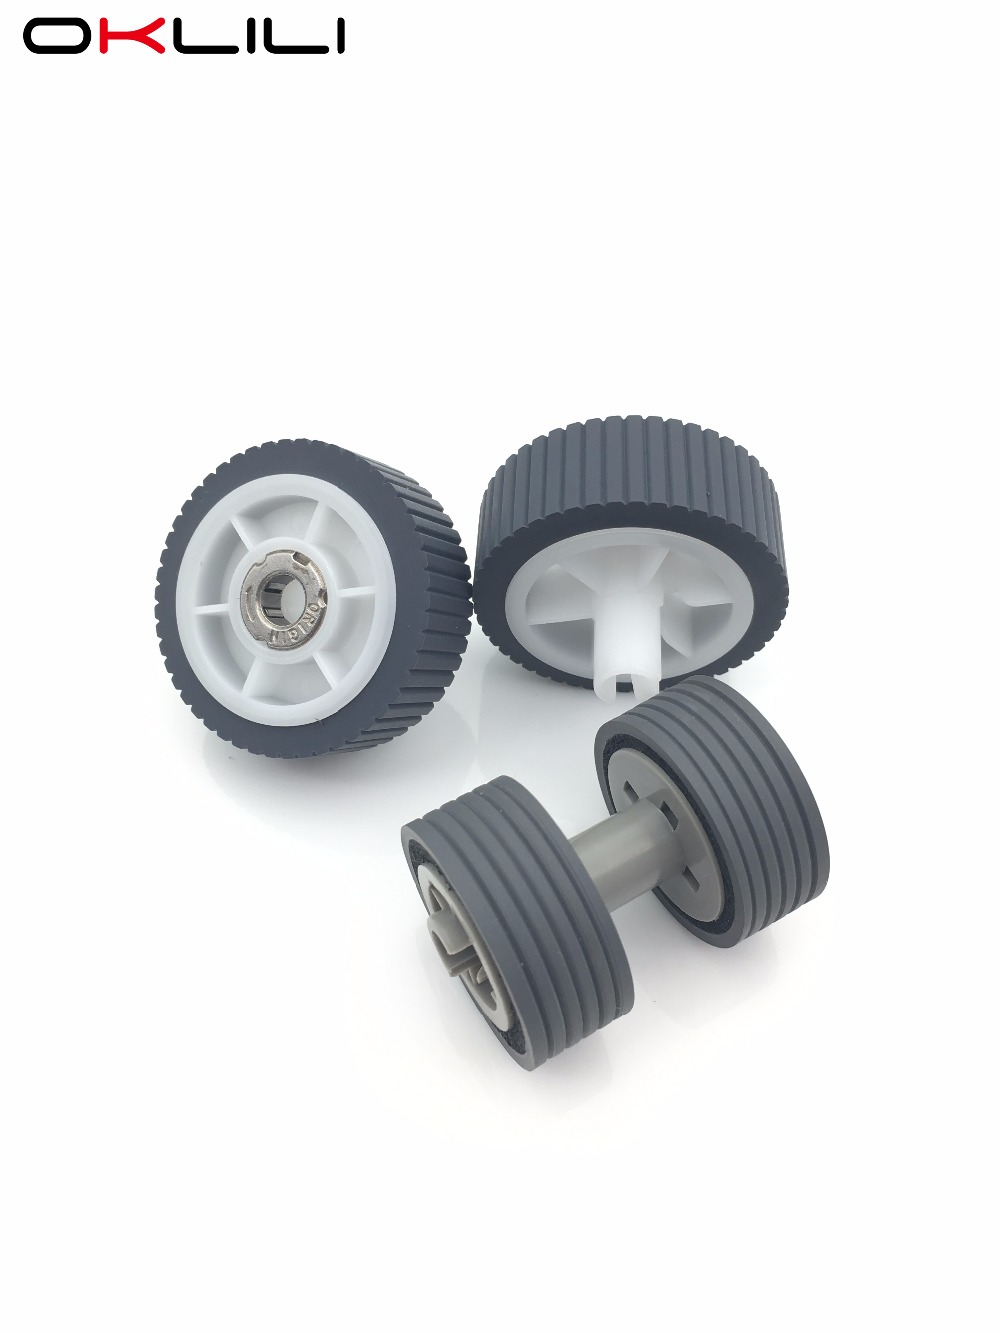 1SETX PA03656-0001 PA03656-E958 PA03656-E976 Brake Roller &amp; Pick Roller Pickup Roller for Fujitsu ScanSnap iX500<br>